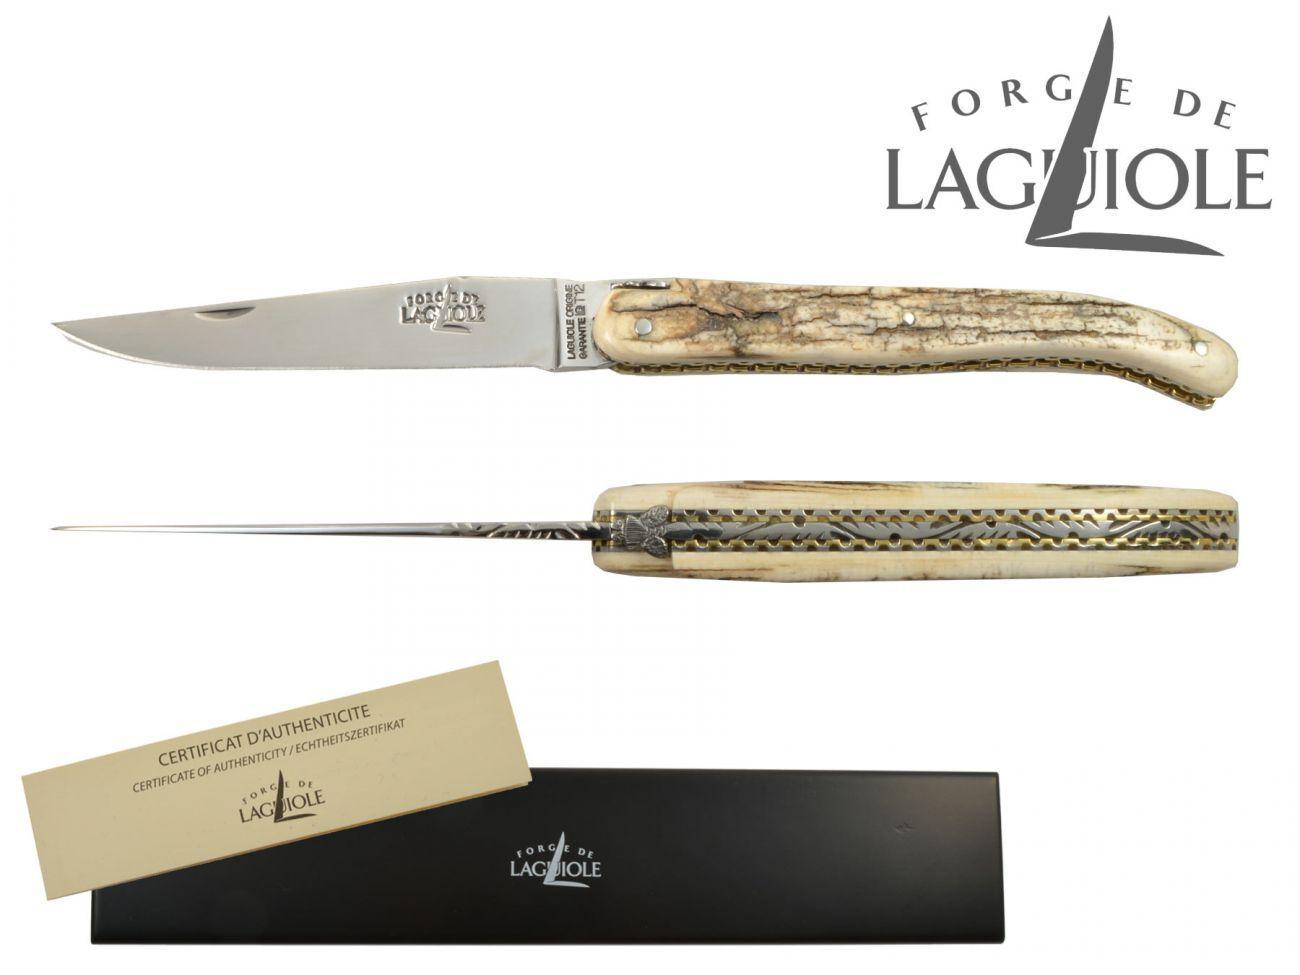 Forge de Laguiole Laguiole Laguiole Taschenmesser 11 cm Mammut Doppelplatine 1011F I MAM BRI 924521